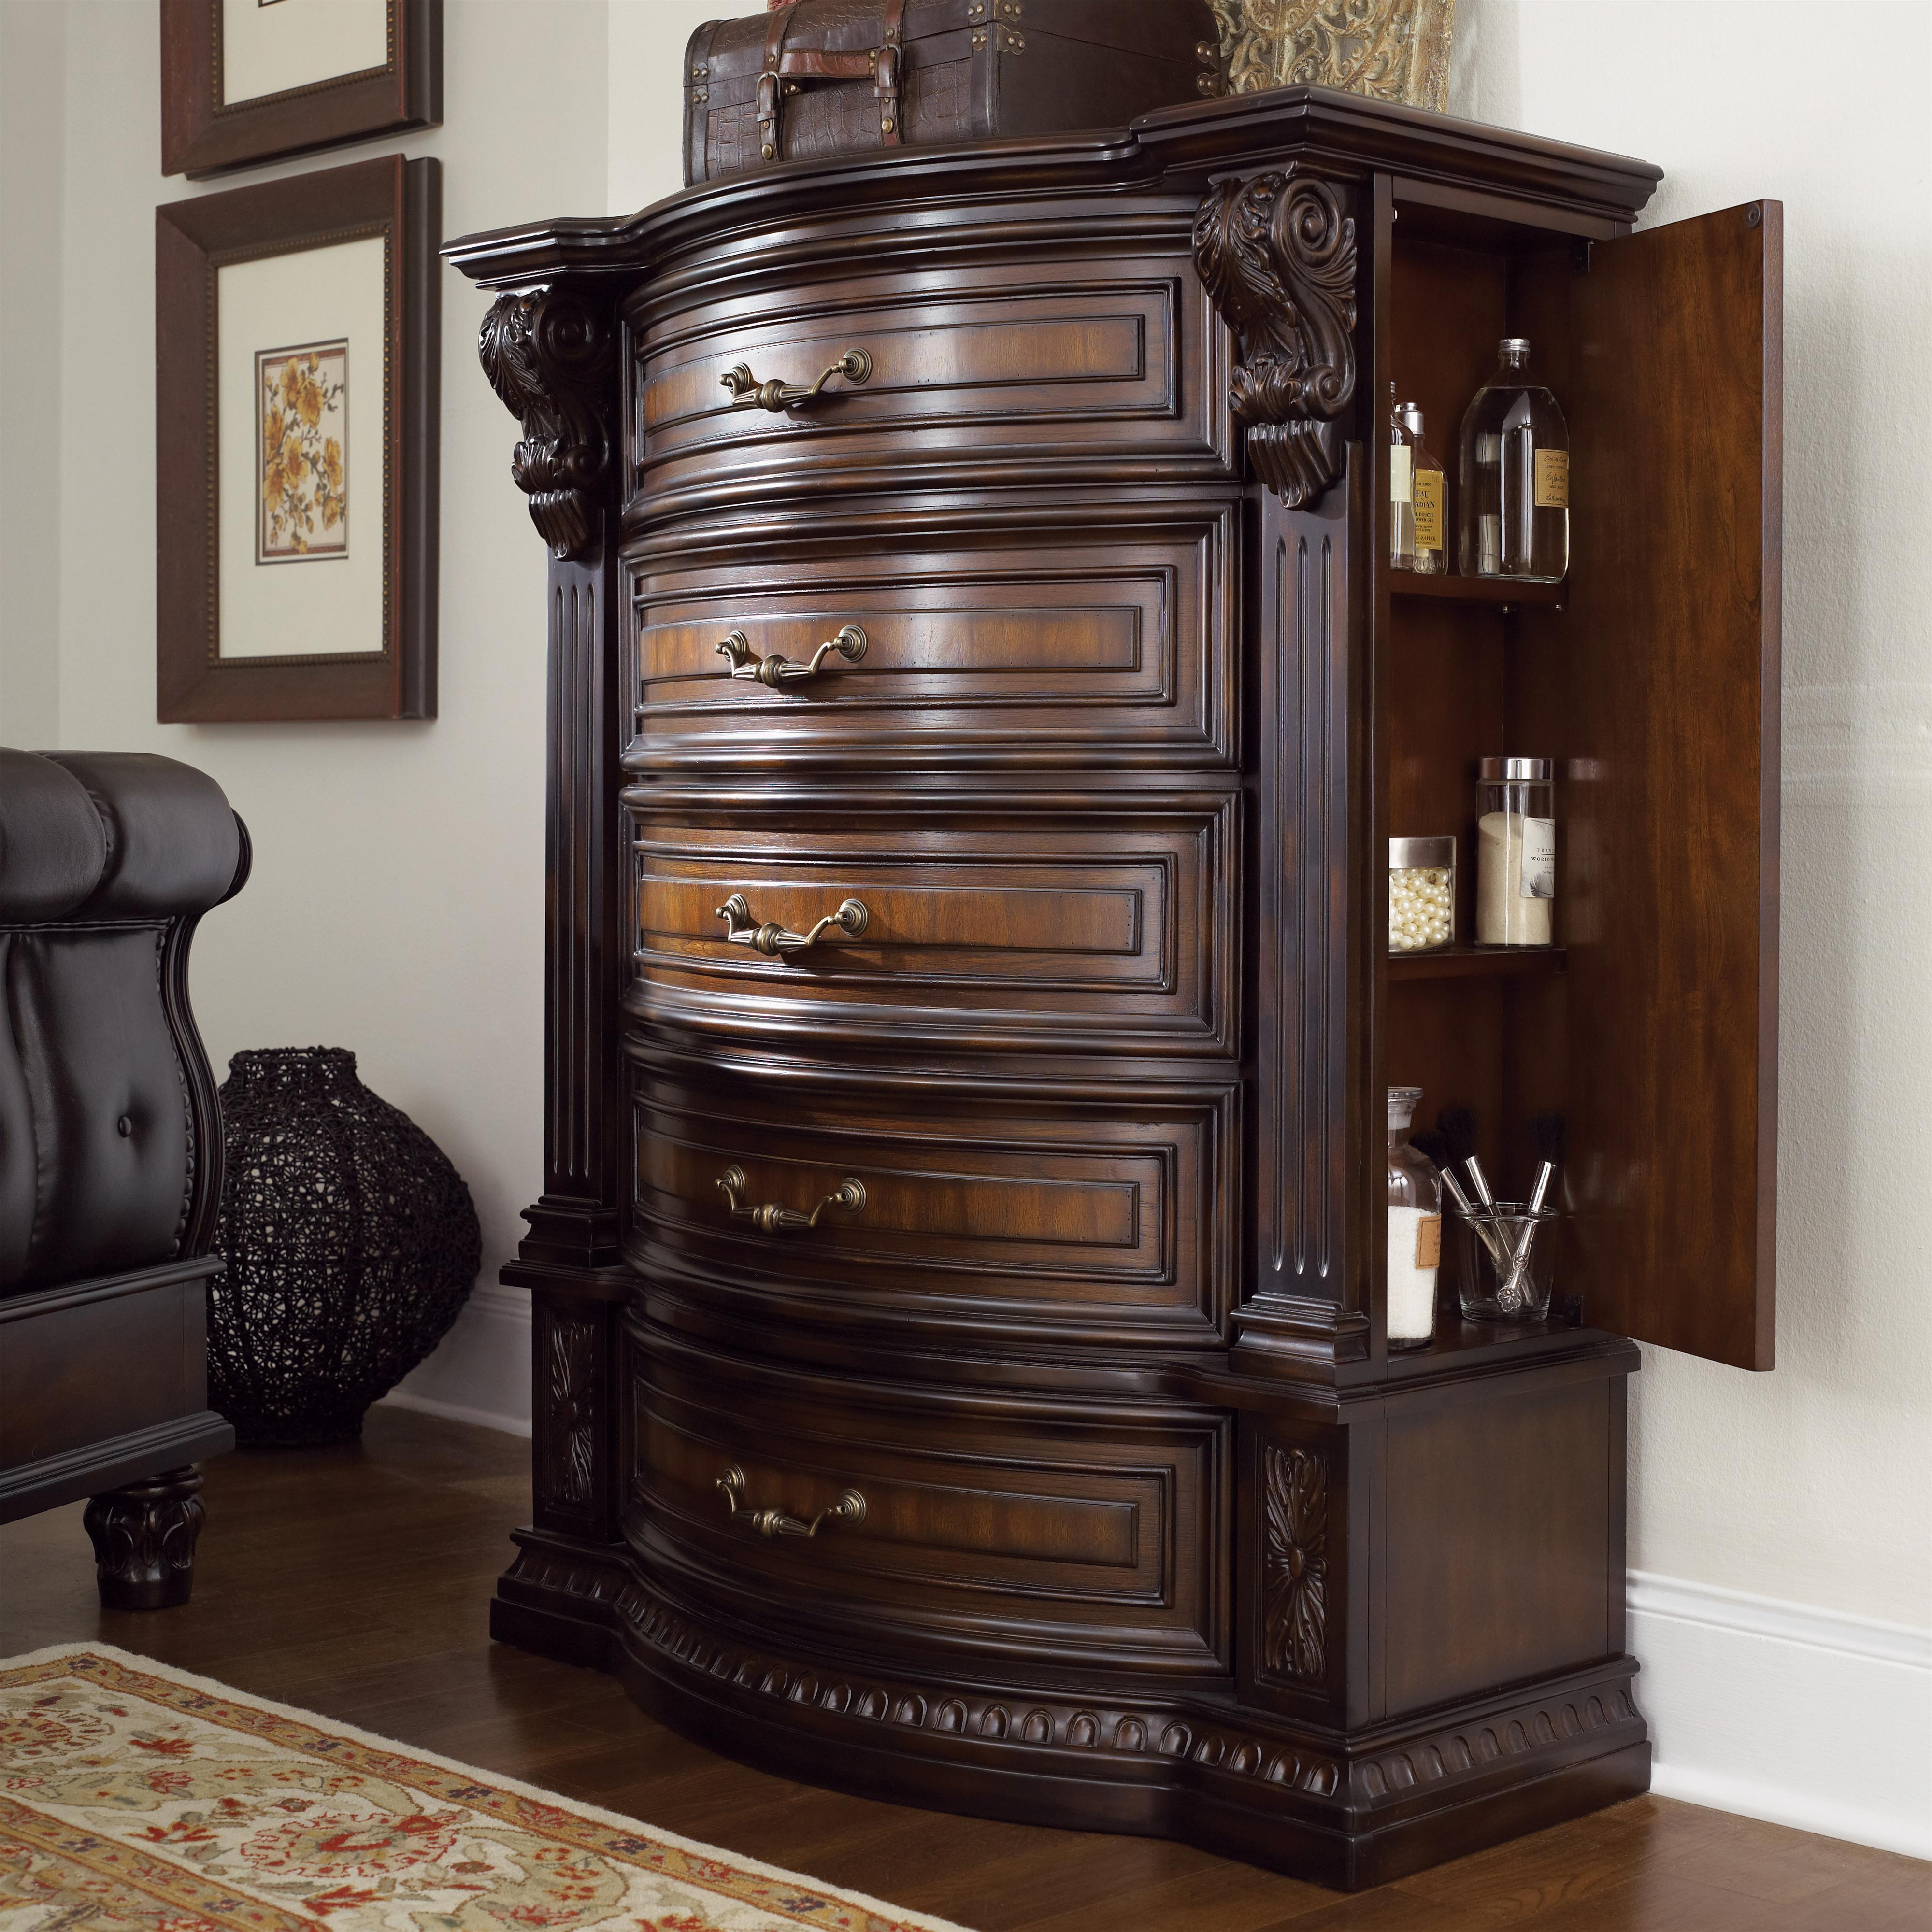 Fairmont designs grand estates chest w 5 drawers royal furniture drawer chests for Fairmont designs grand estates bedroom